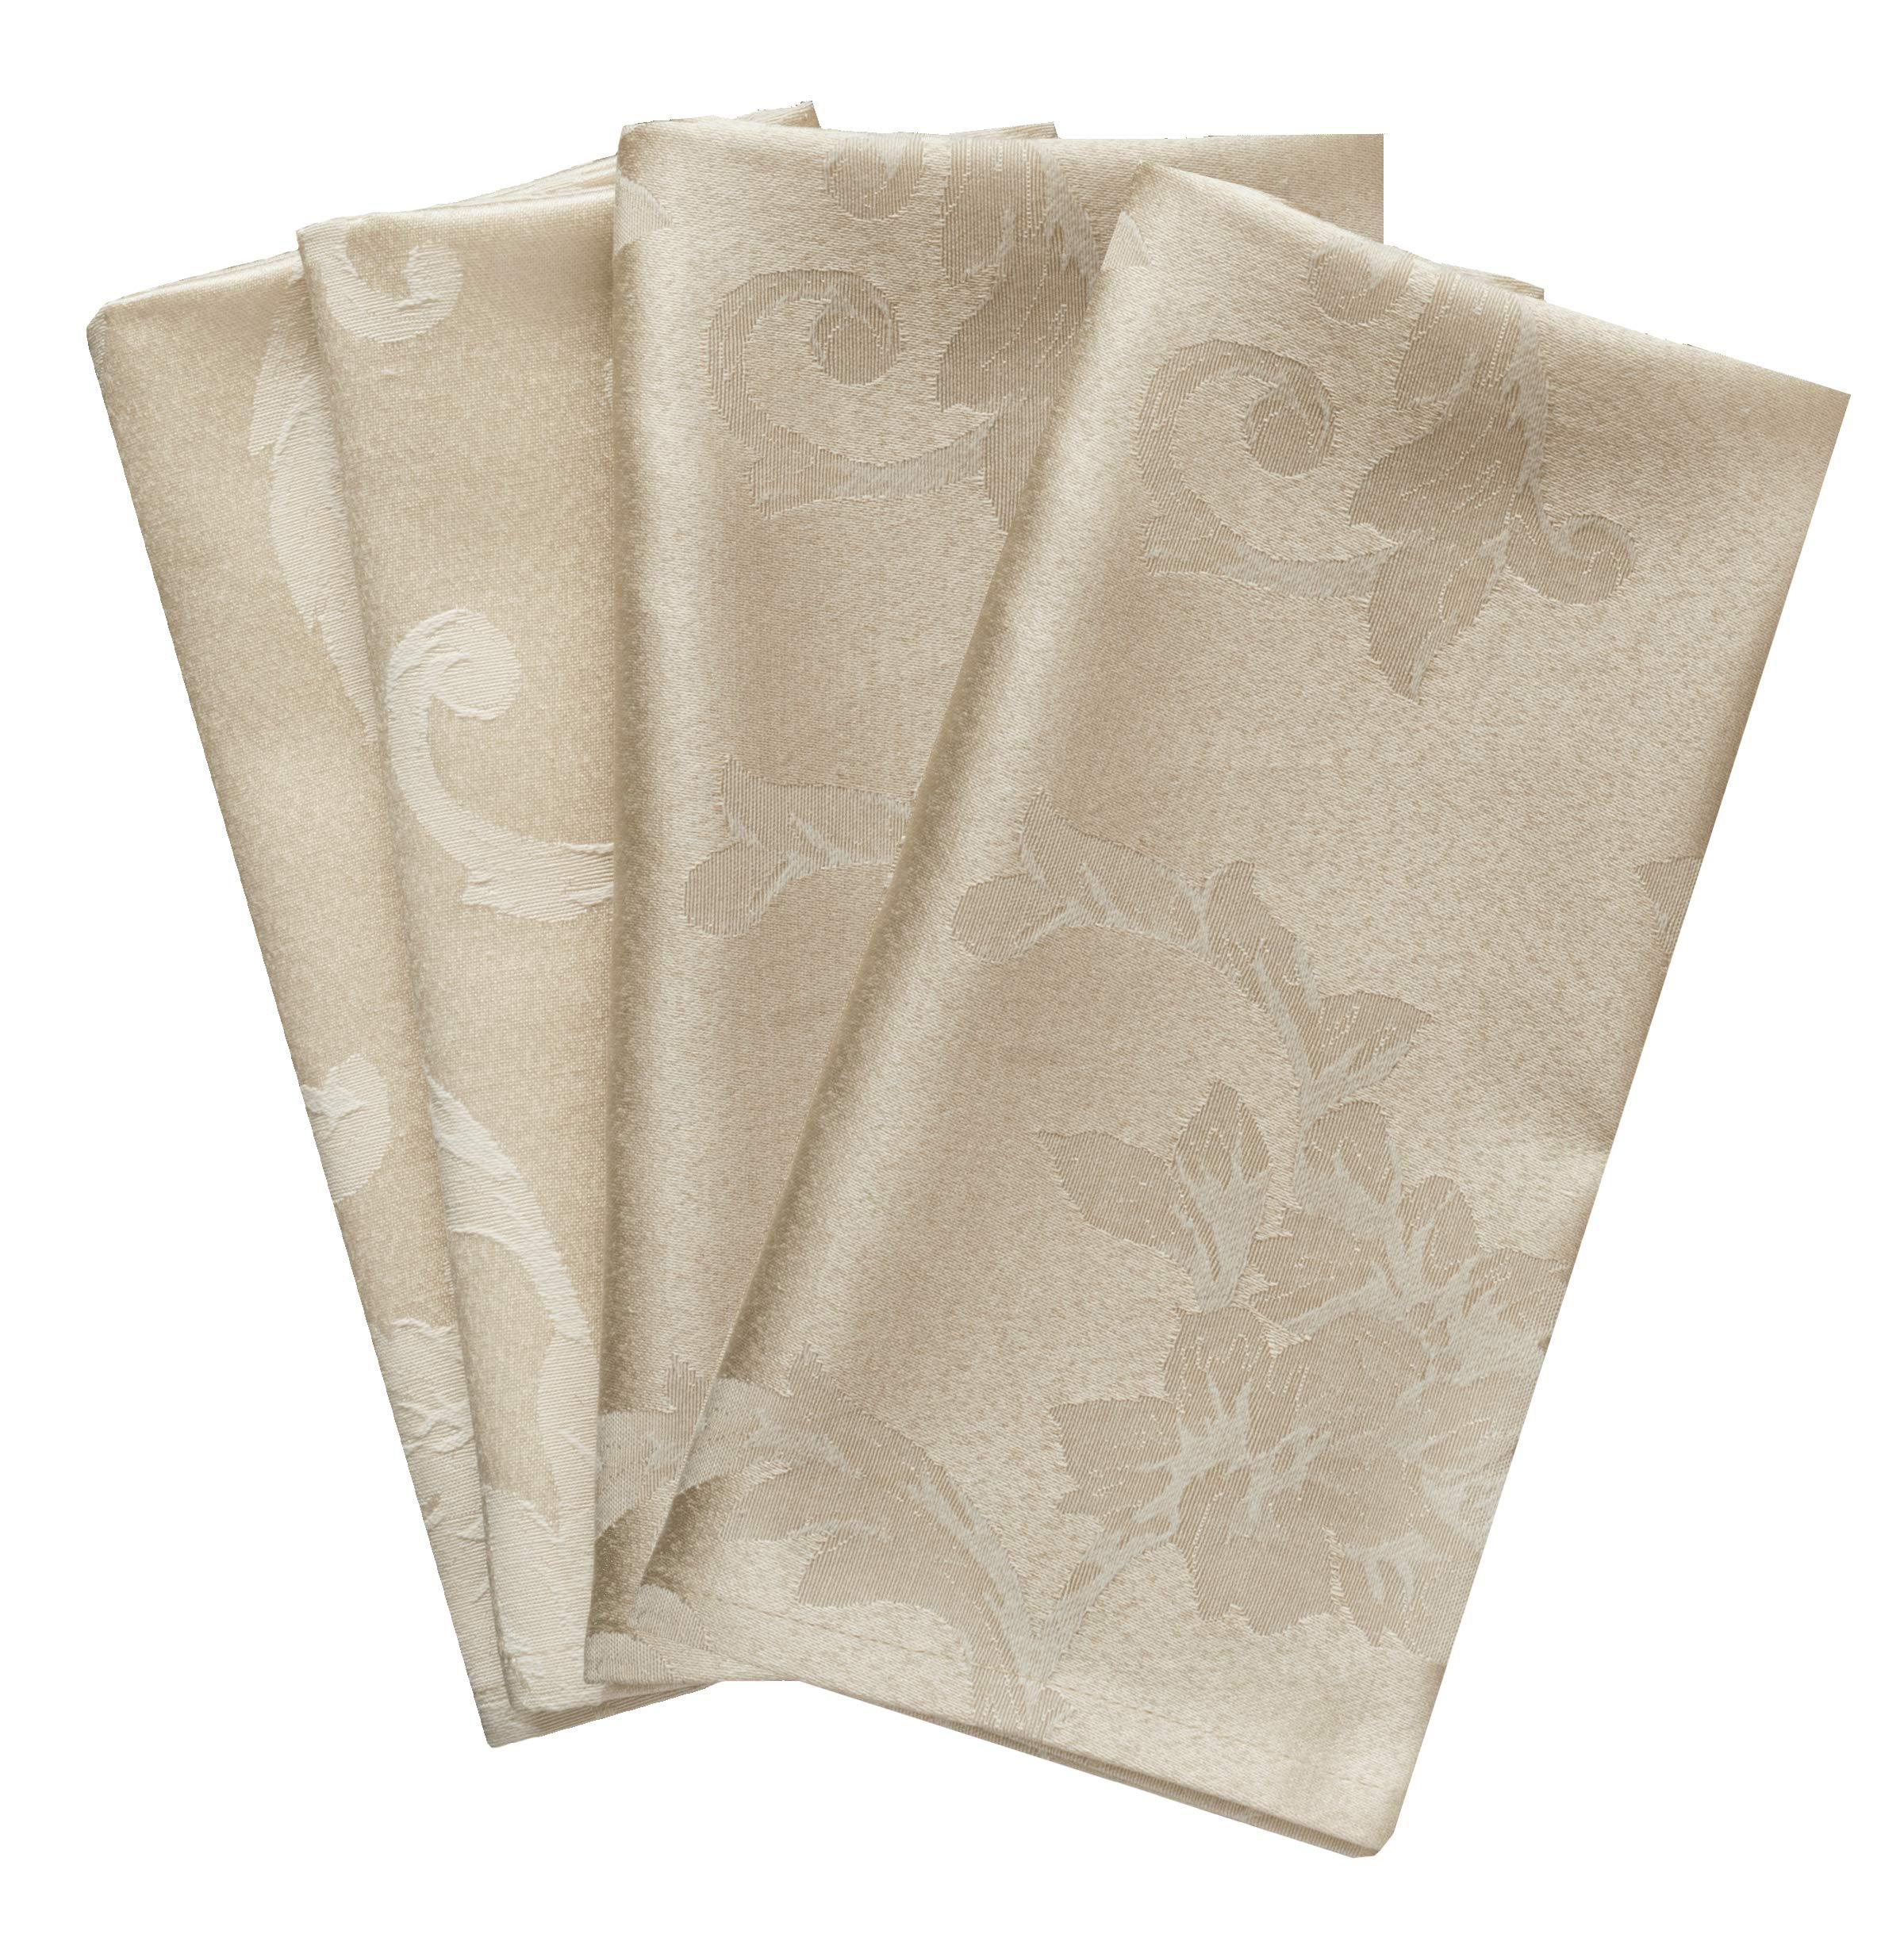 Benson Mills Harmony Scroll Set of 4 Napkins (Birch, 18'' x 18'' Napkin) by Benson Mills (Image #1)